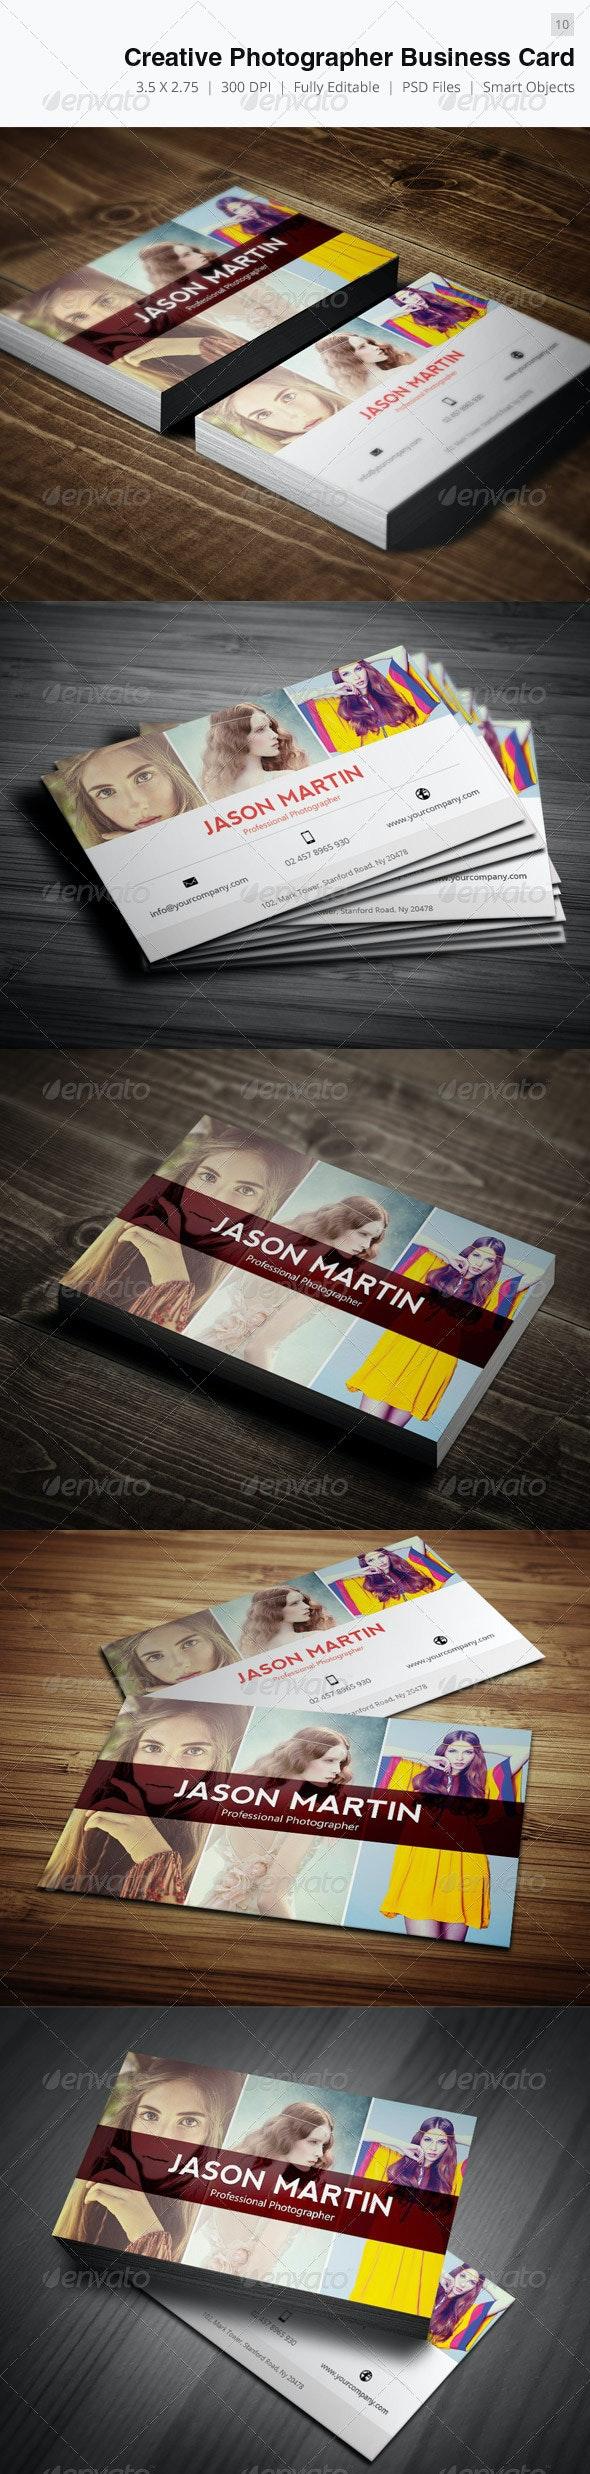 Creative Photographer Business Card - 10 - Creative Business Cards